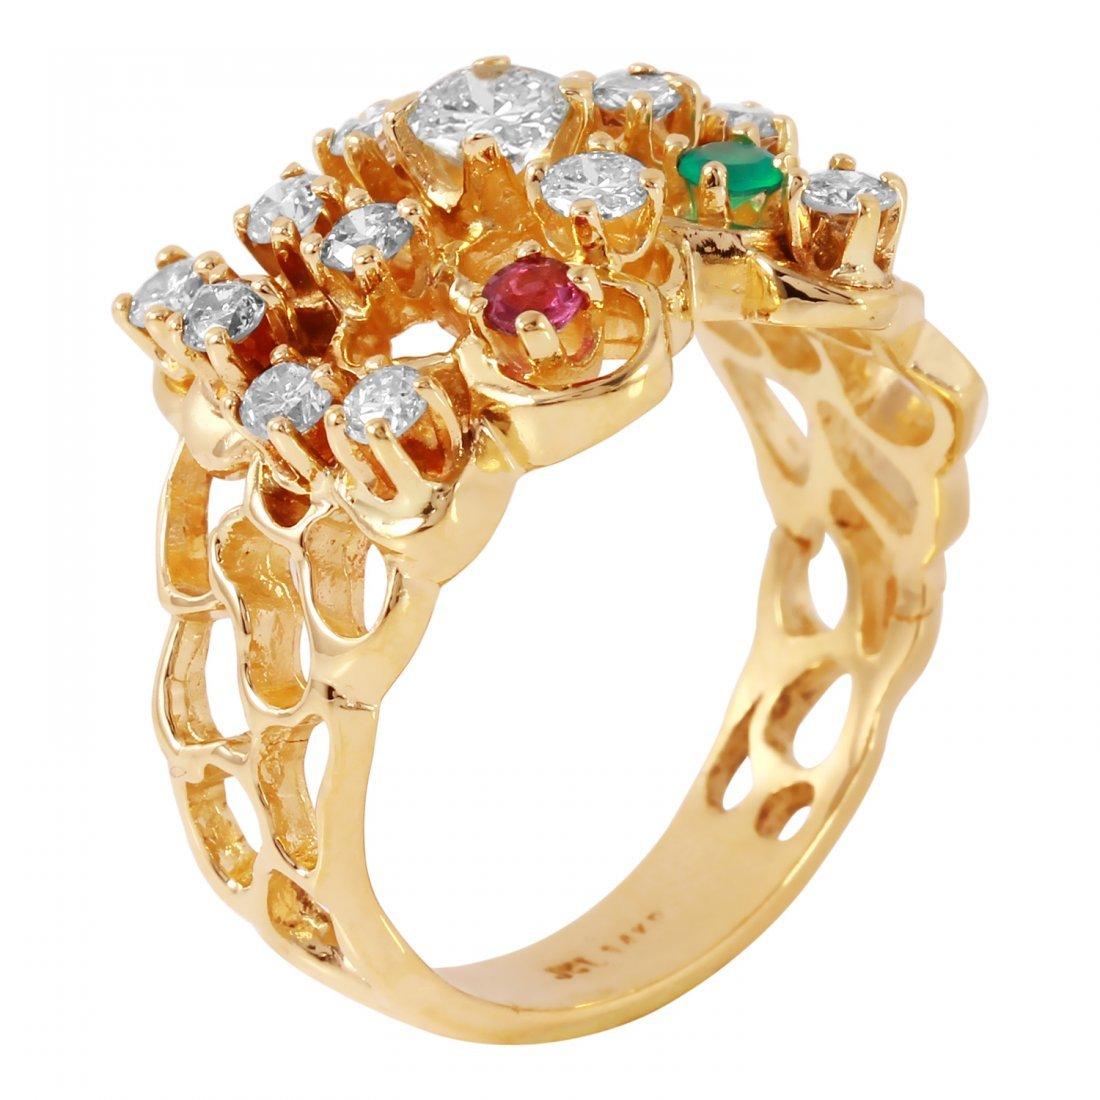 Ladies 1CTW Diamond And Multigem 14K Yellow Gold Ring - 2